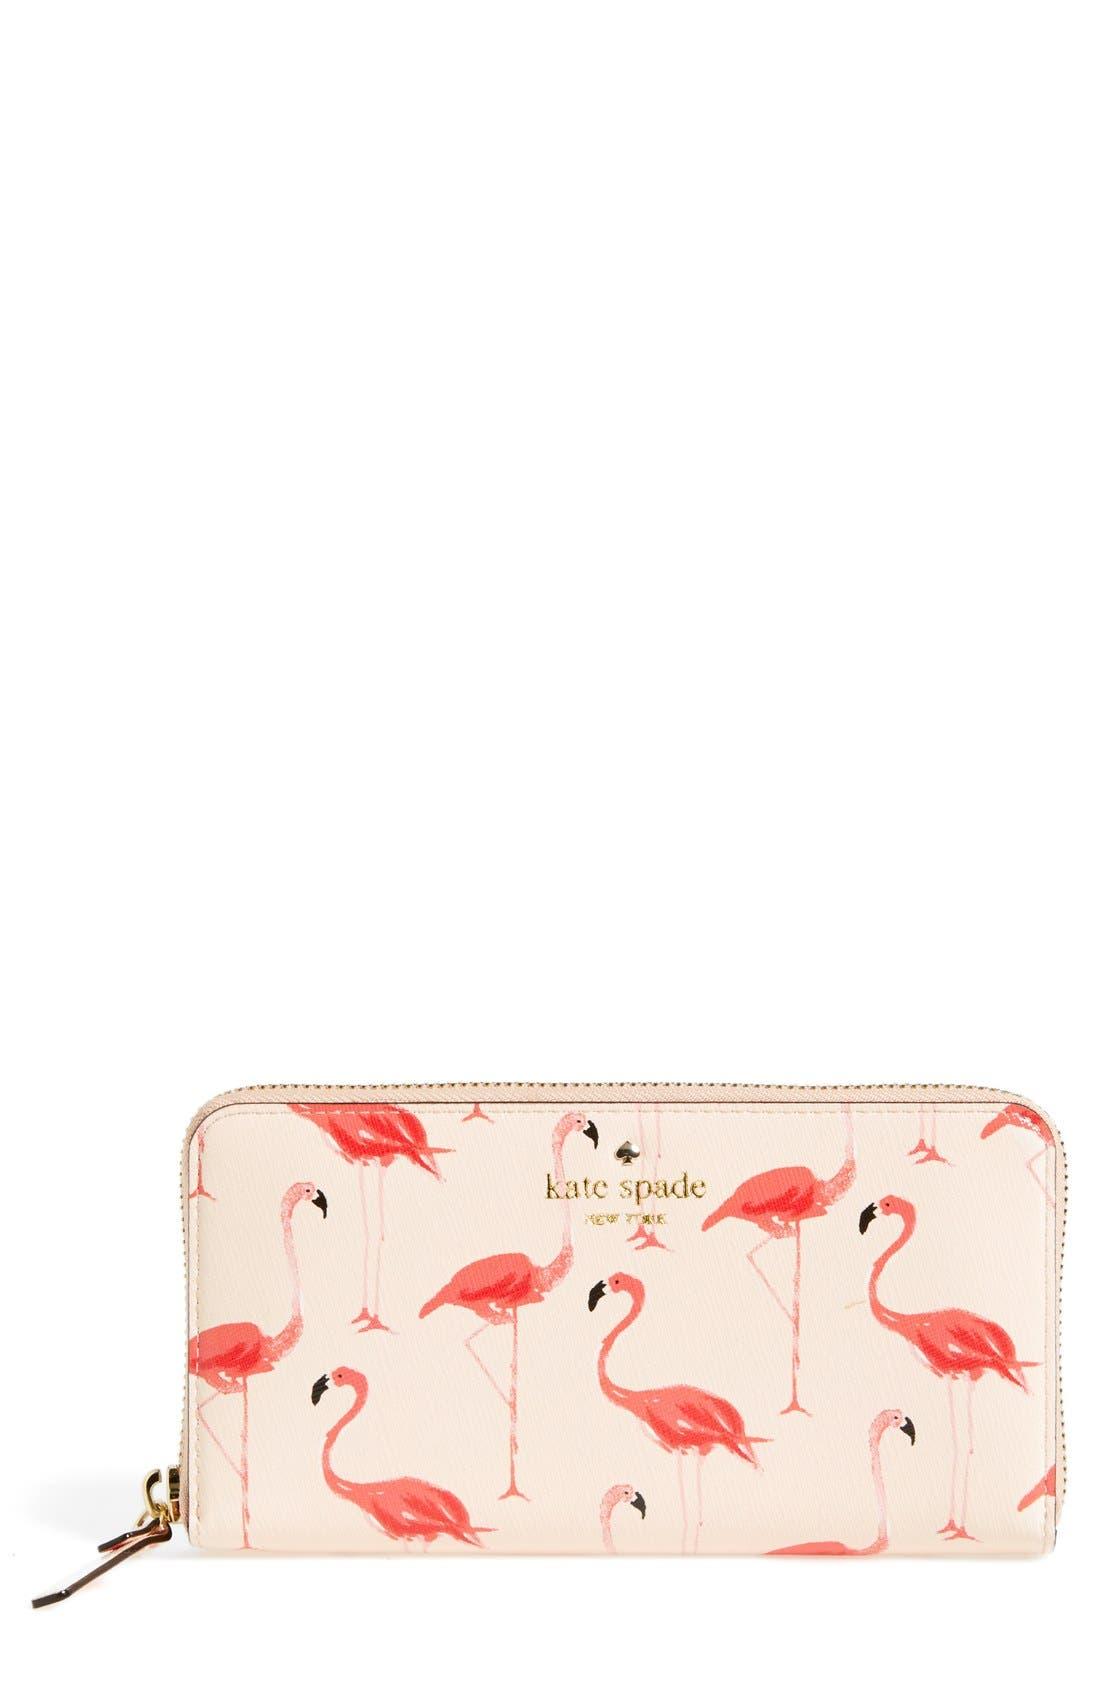 kate spade 'cedar street - lacey' zip wallet,                         Main,                         color, 191